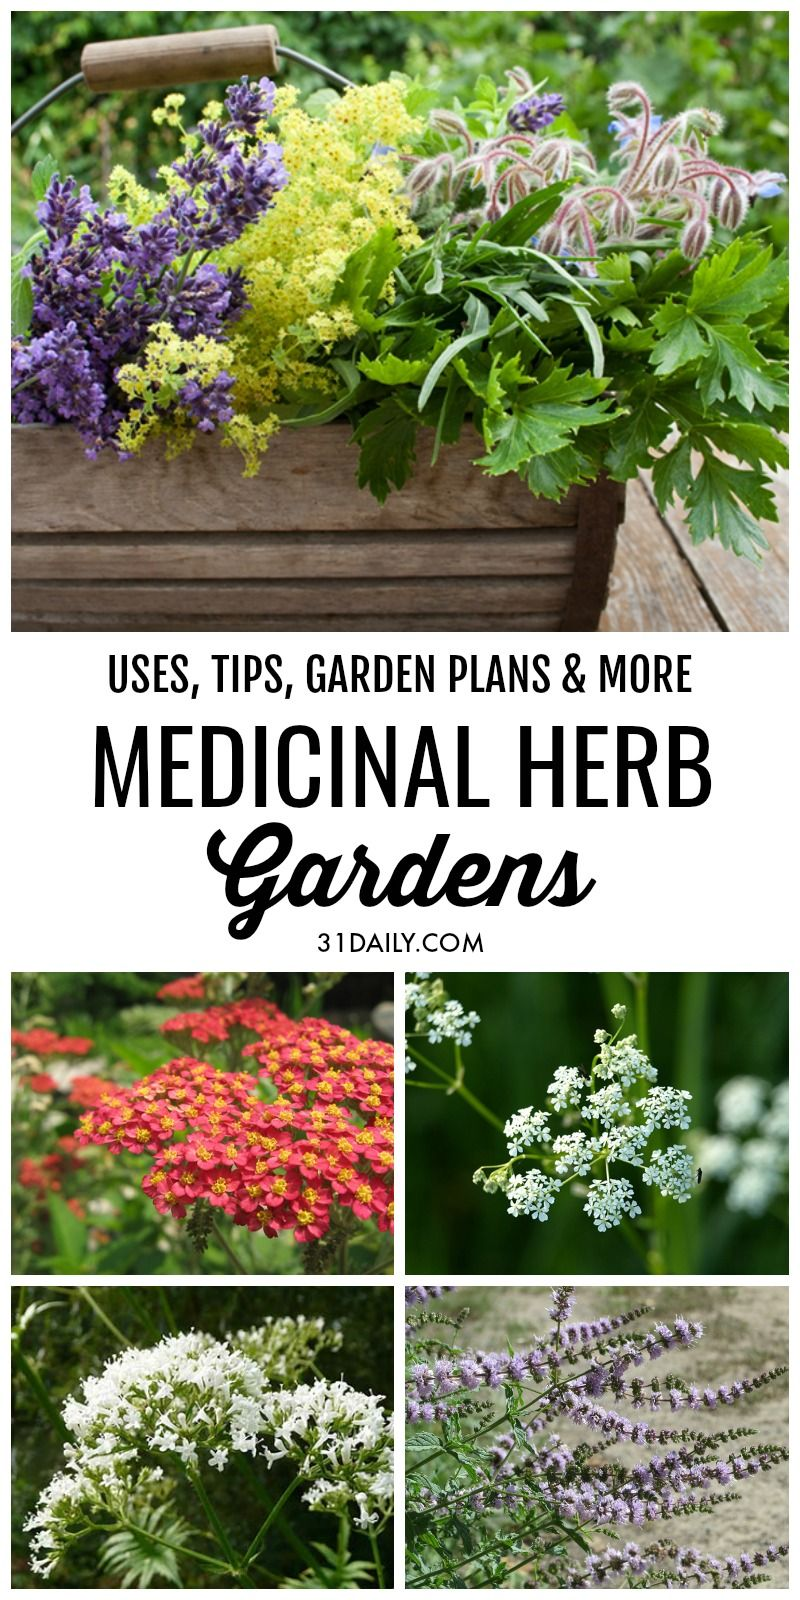 Medicinal Herb Gardens Series Medicinal Herbs Garden Indoor